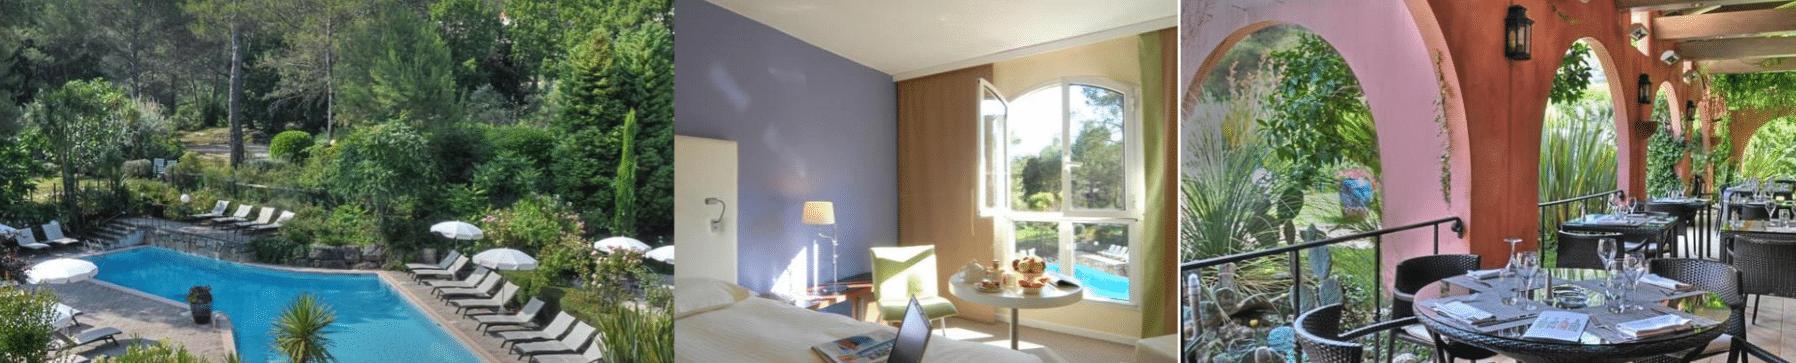 hotel gp monaco